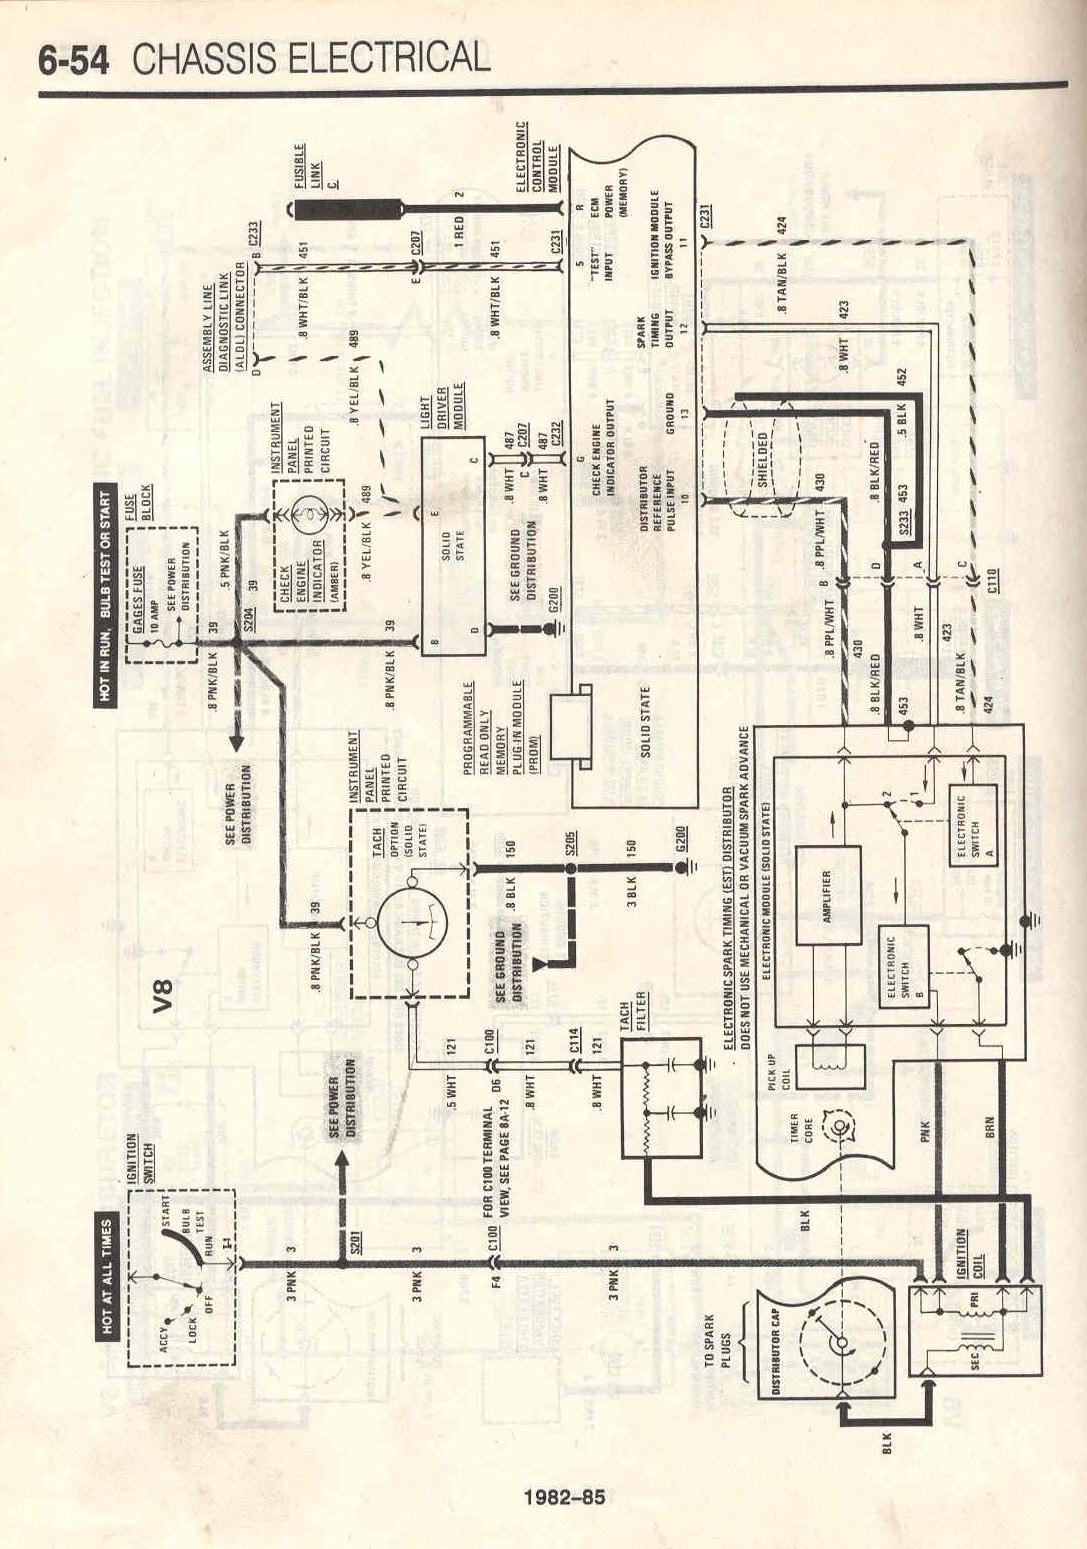 82 camaro wiring diagram car info 82 corvette wiring diagram #6